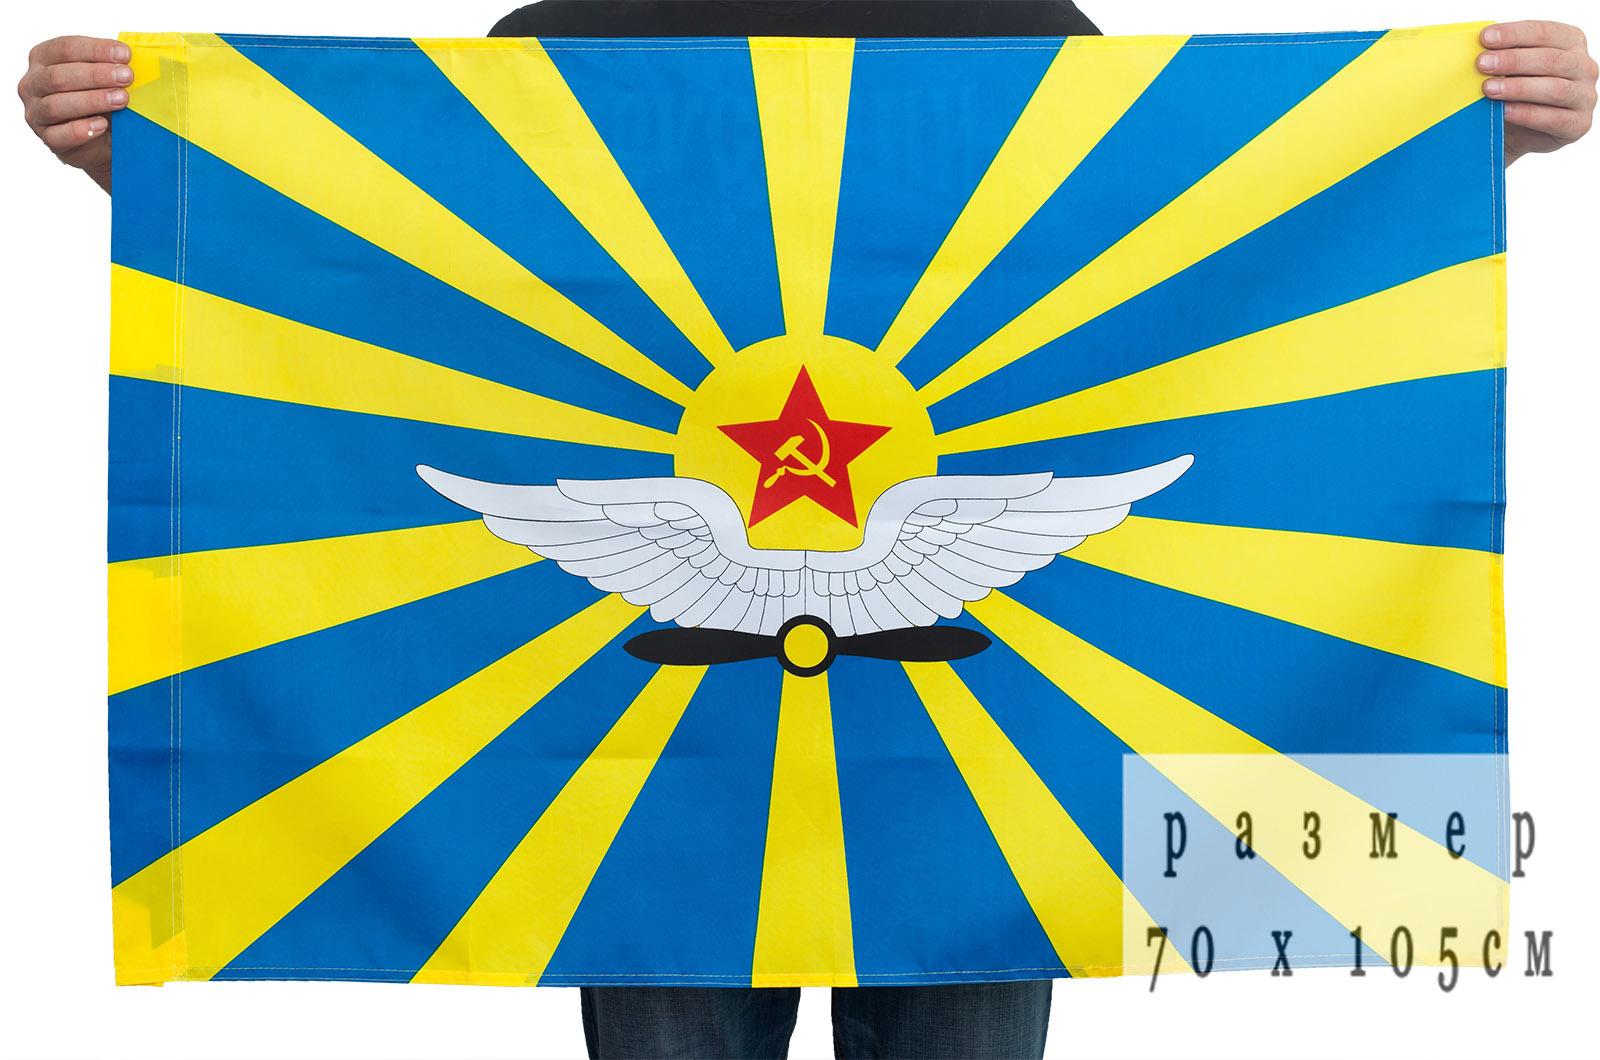 Двухсторонний флаг ВВС СССР